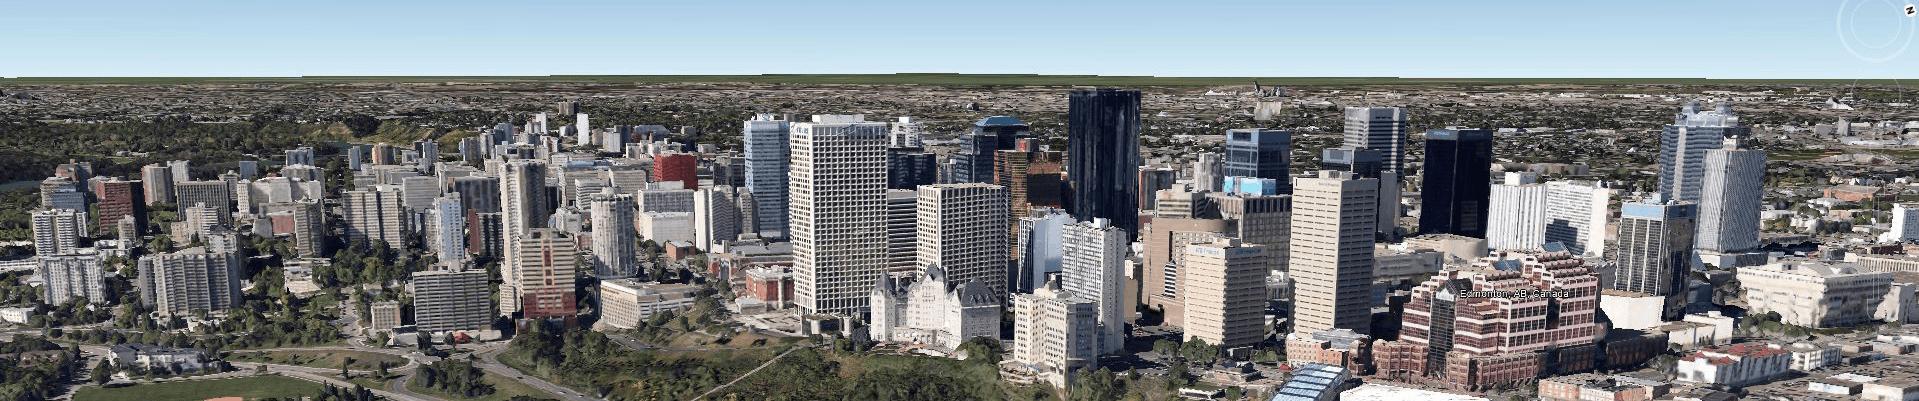 Edmonton-Google-Earth